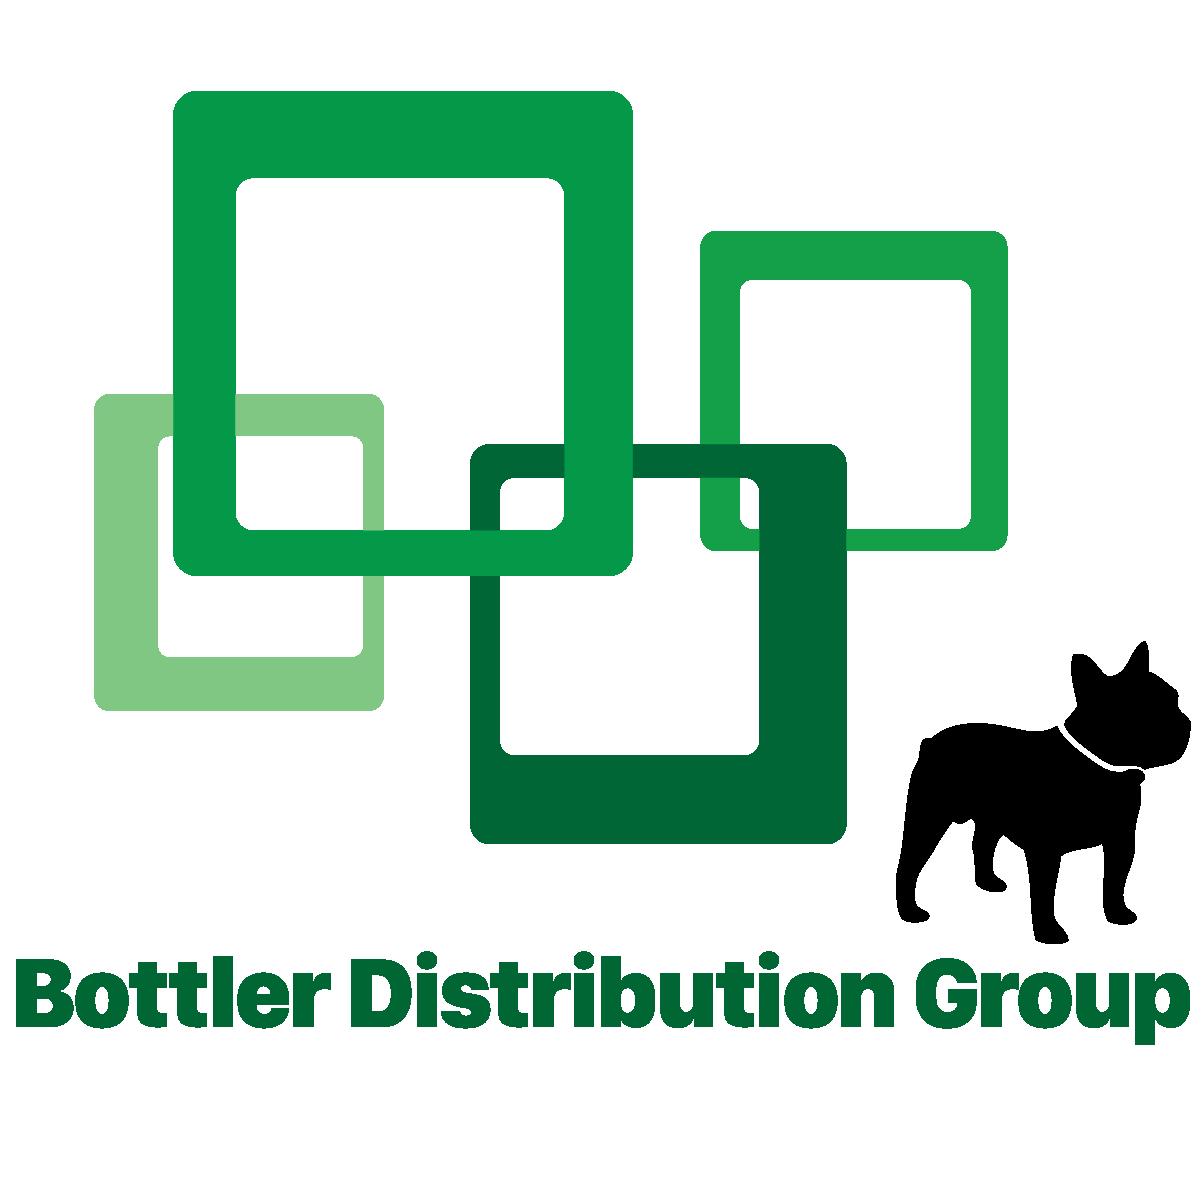 Bottler Distribution Group